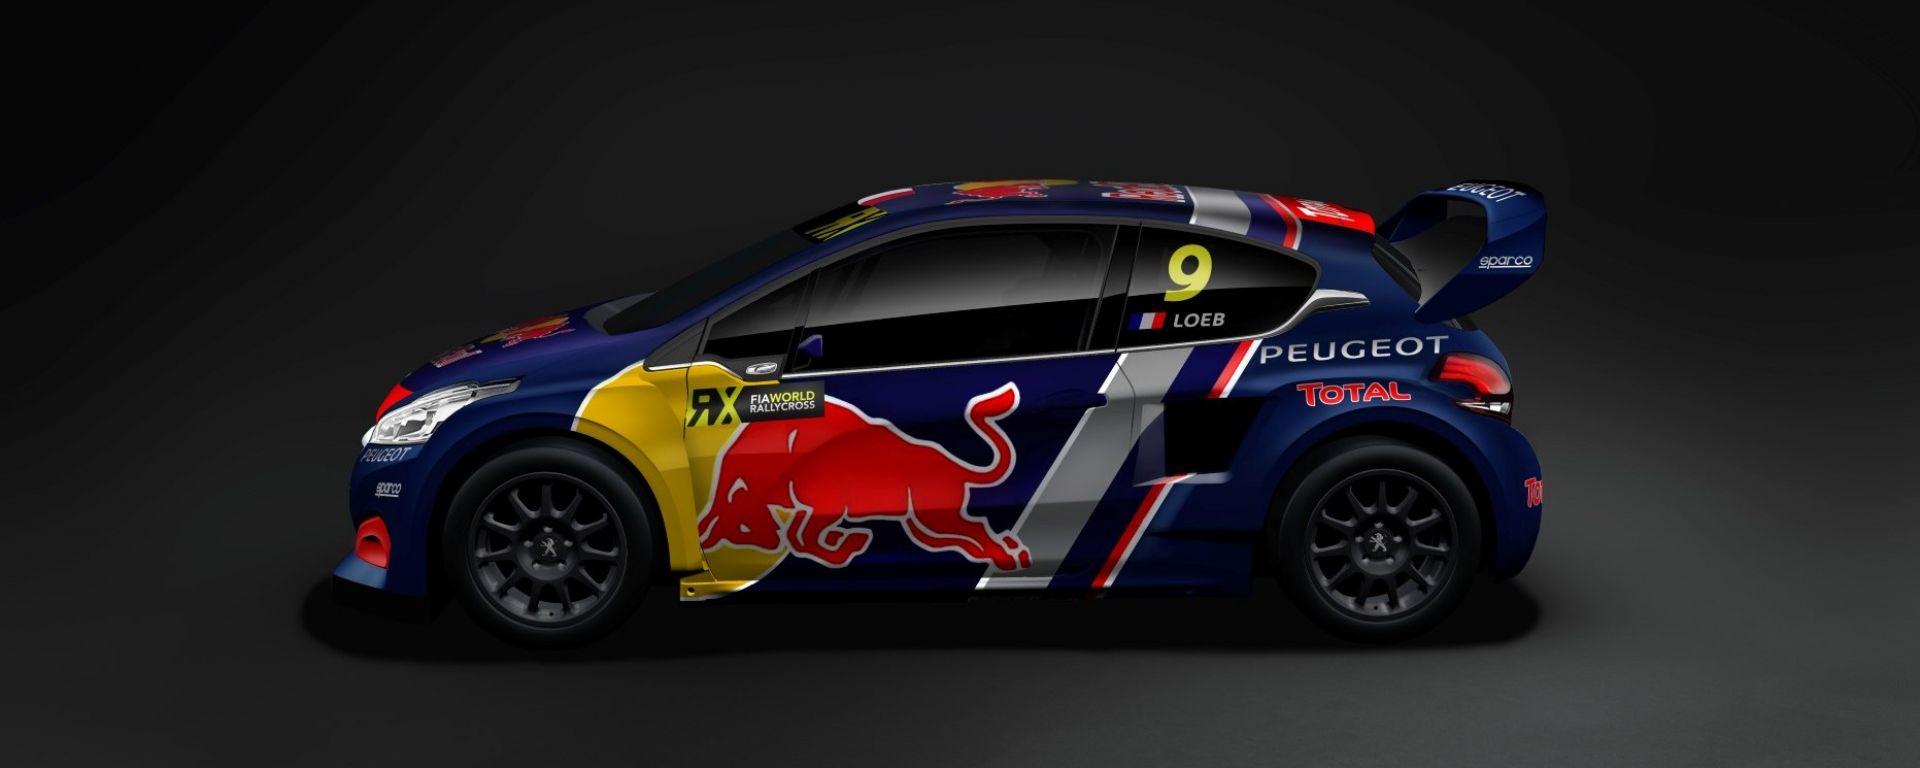 La Peugeot di Sebastien Loeb - Rallycross 2018